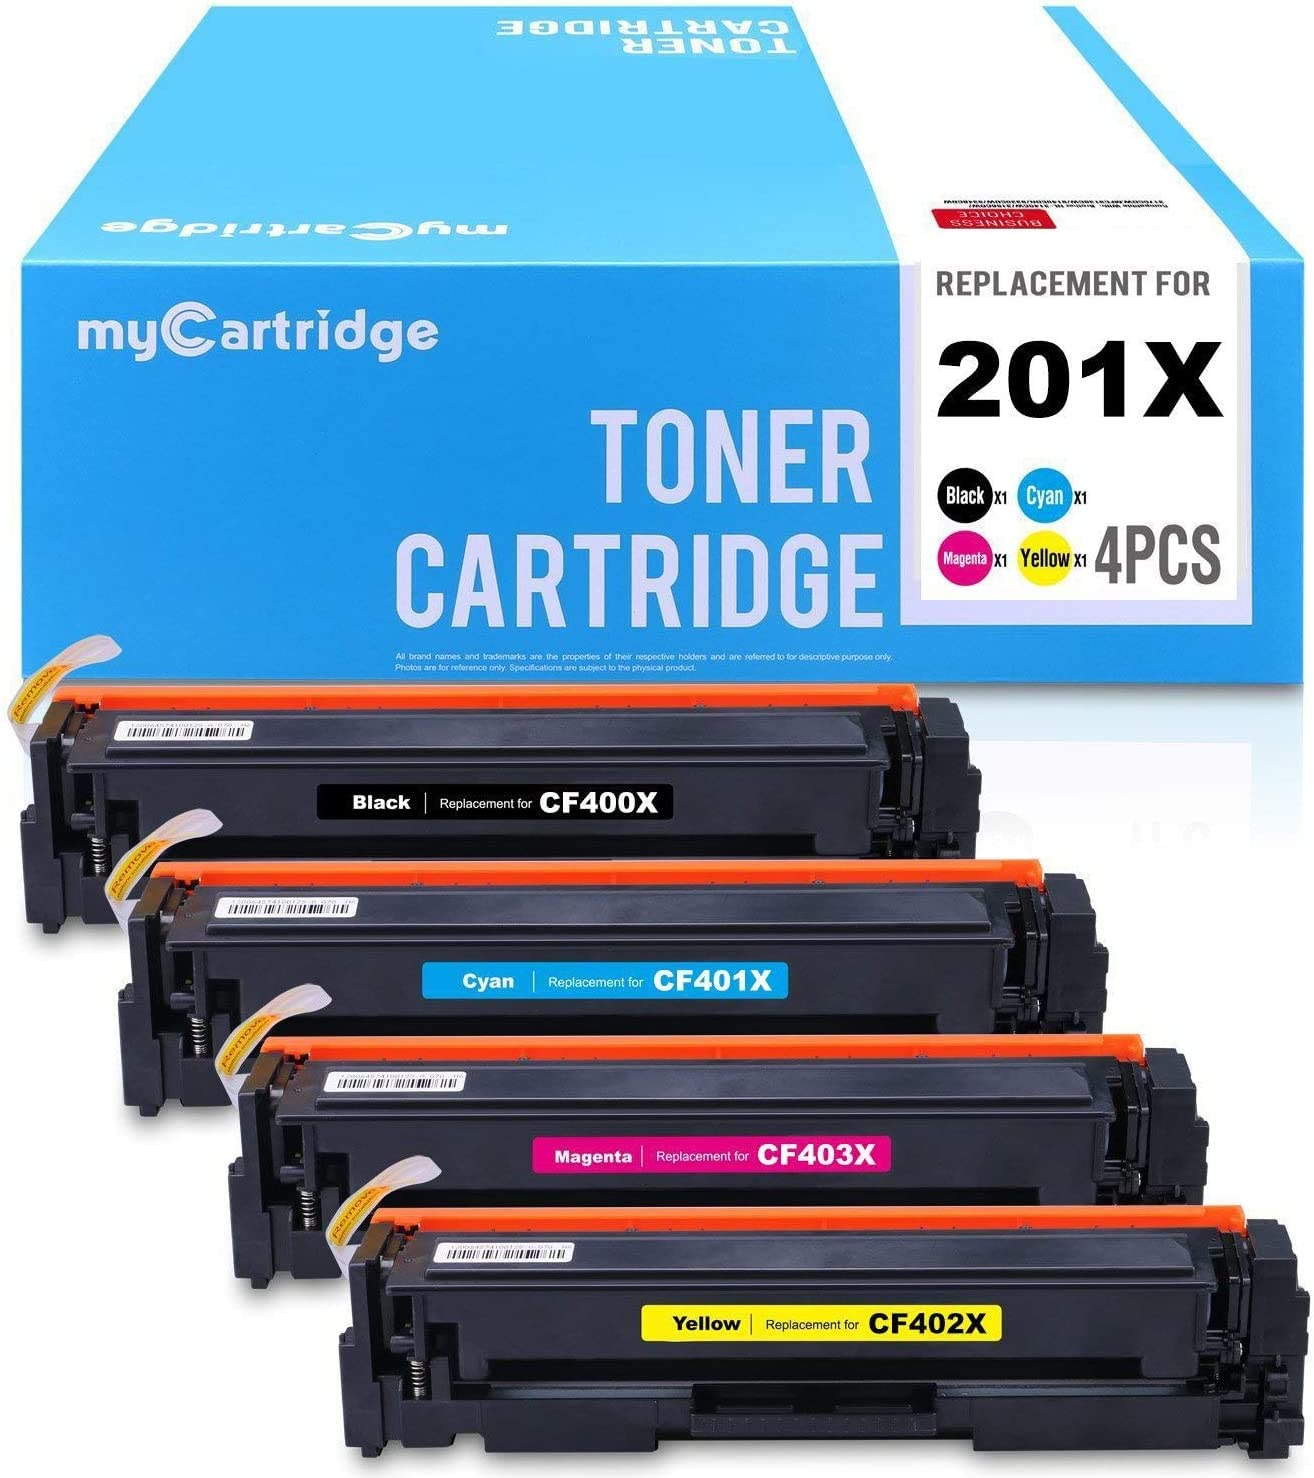 myCartridge Compatible Toner Cartridge Replacement for HP 201X CF400X CF401X CF402X CF403X (1 Black 1 Cyan 1 Yellow 1 Magenta, 4-Pack)